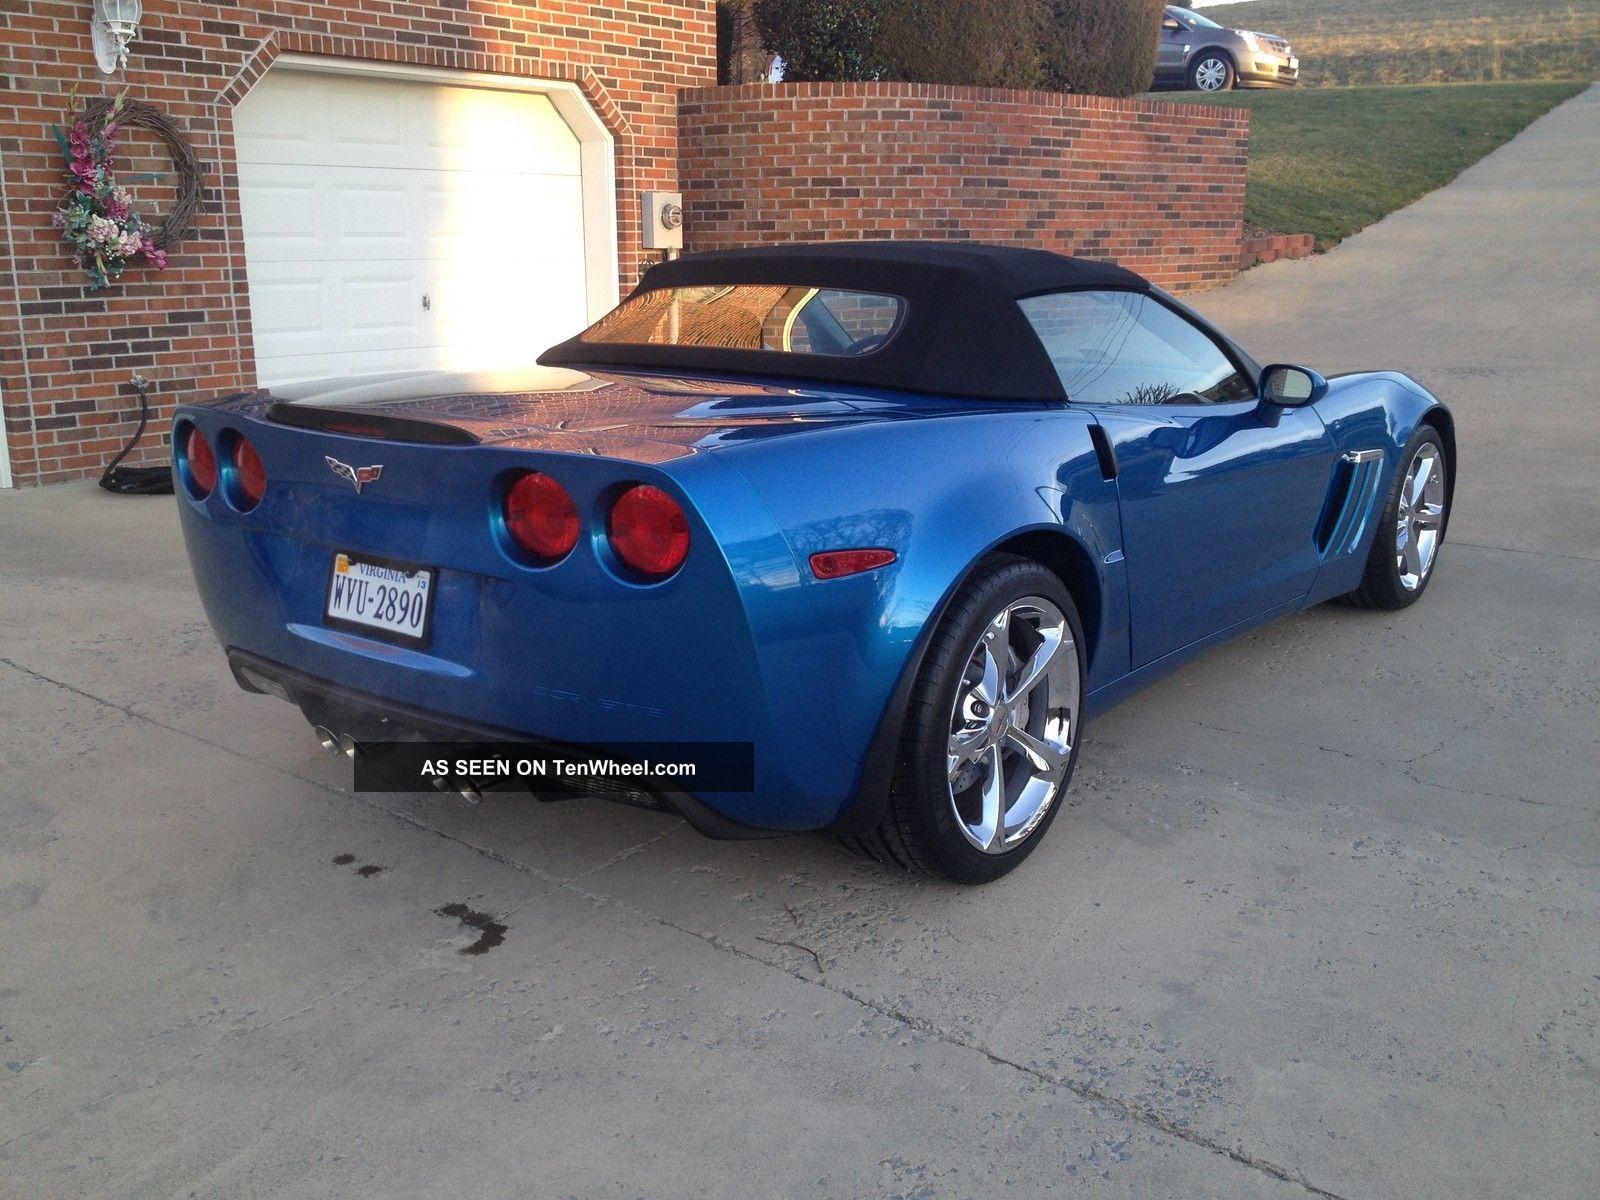 2011 grand sport corvette convertible 3lt jet stream blue 2 lgw - 2011 Chevrolet Corvette Convertible 3lt